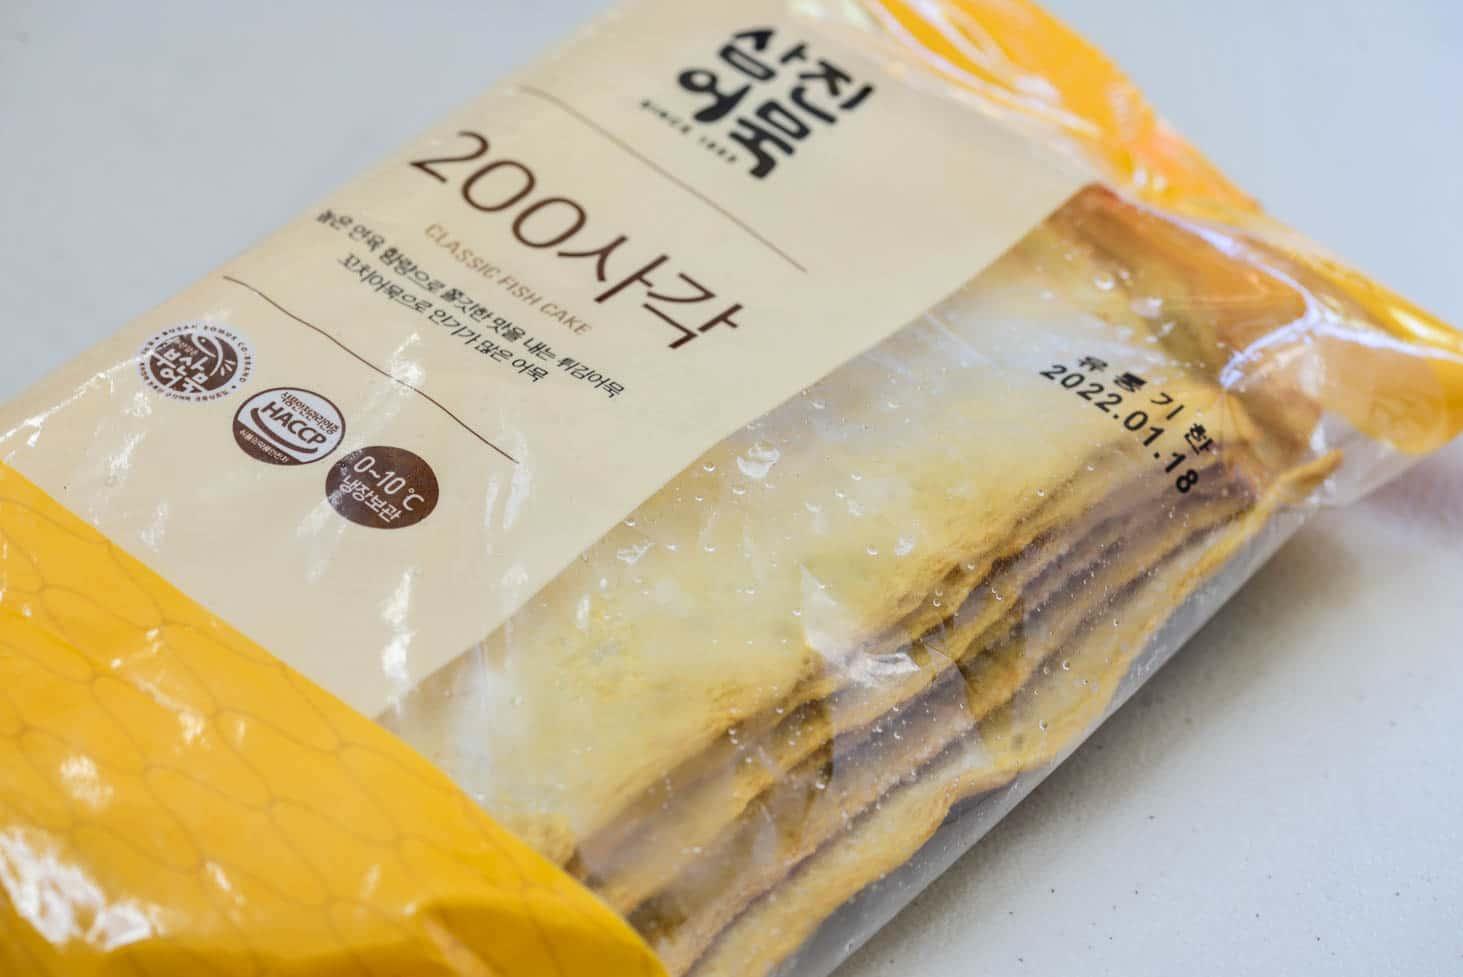 DSC9757 01 - Eomuk Bokkeum (Stir-fried Fish Cake)